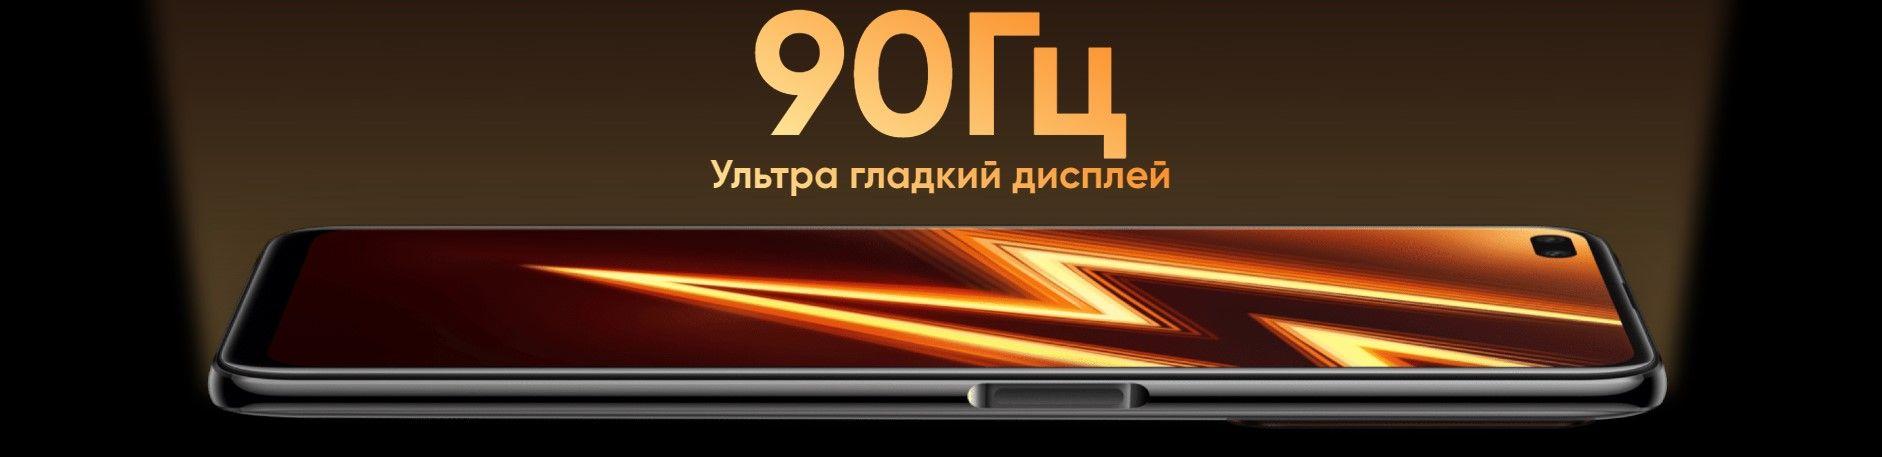 Realme 6 Pro дисплей